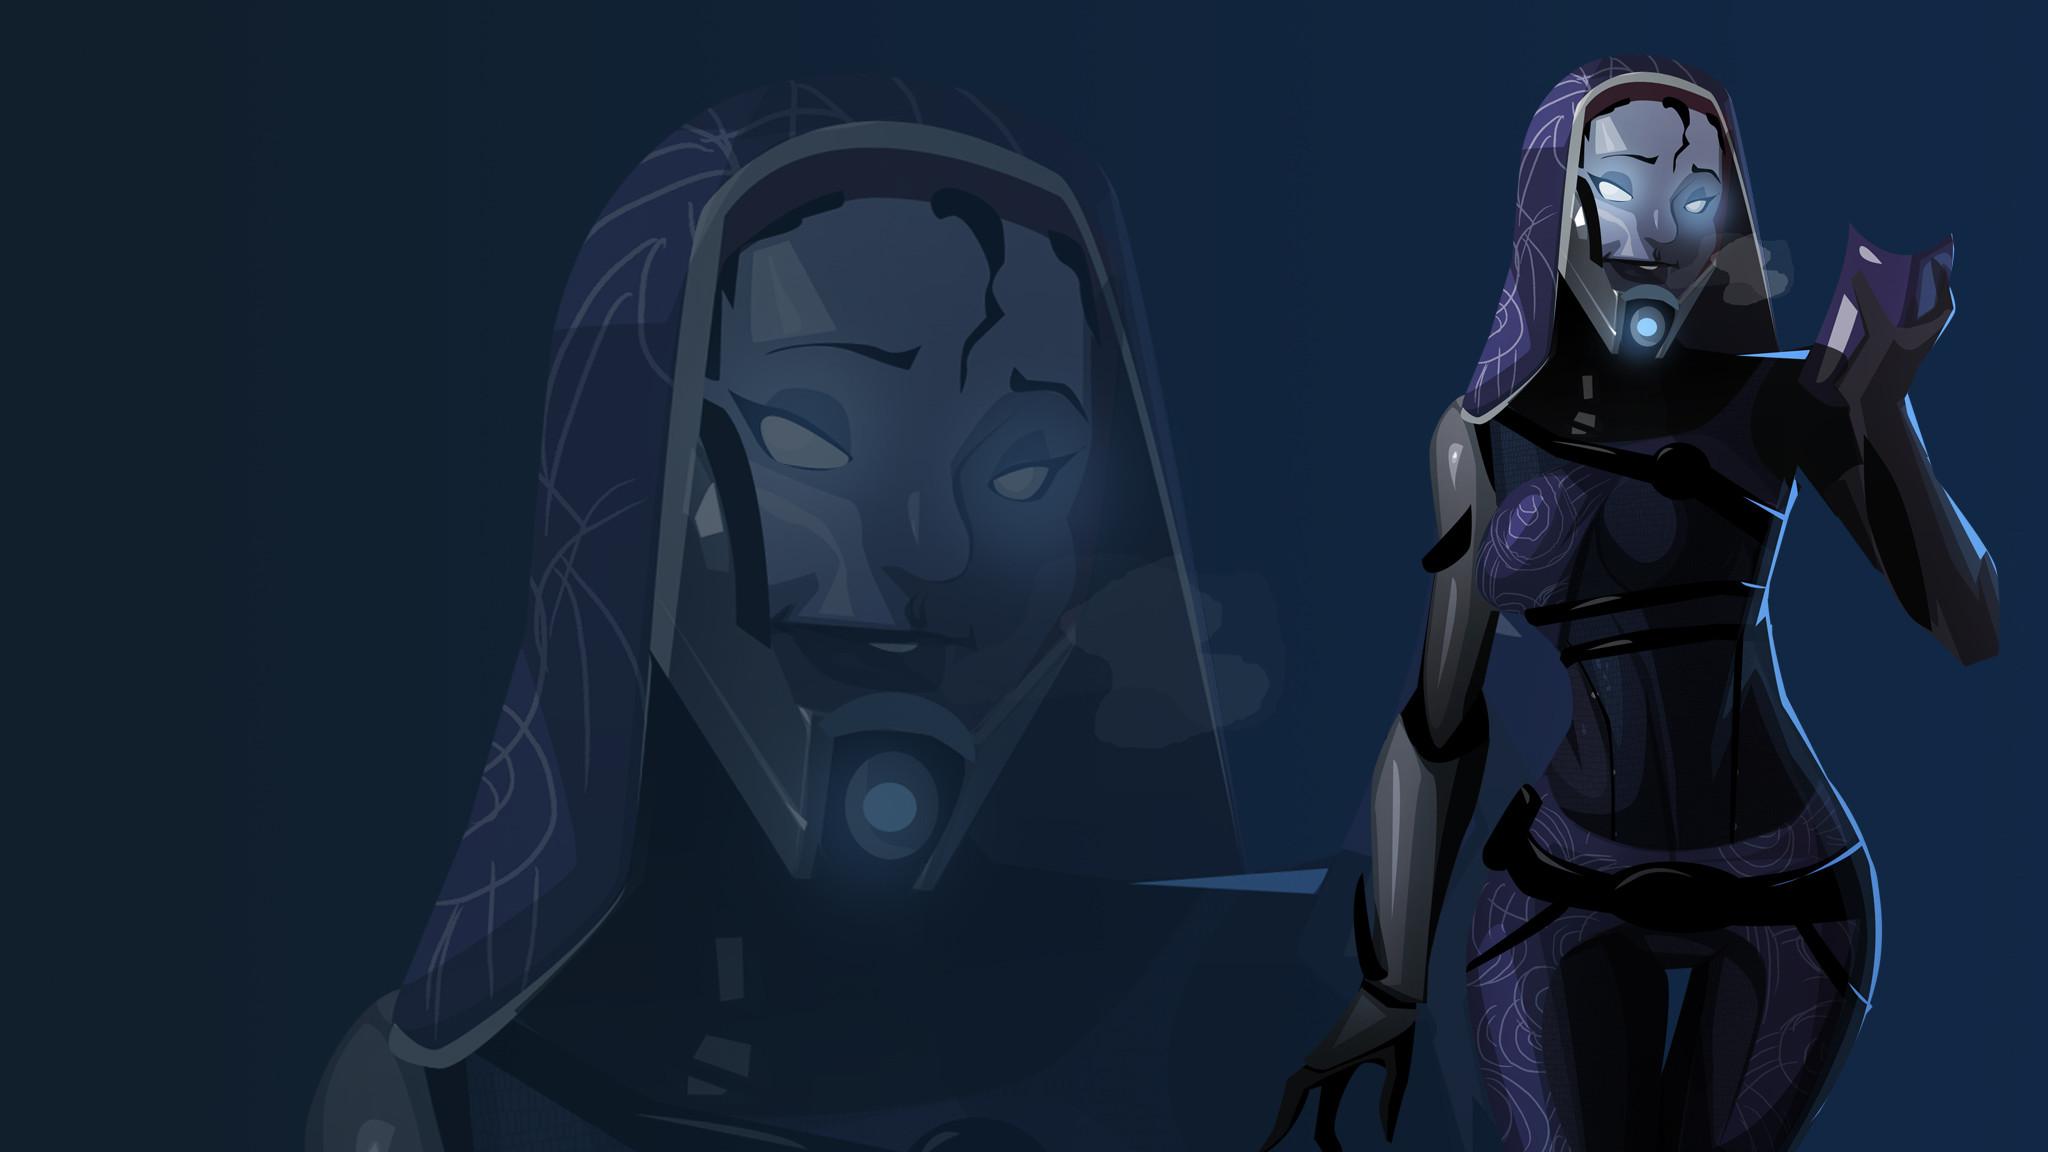 Maskless Tali Wallpaper by morganagod.deviantart.com on @deviantART · Mass  Effect Tali